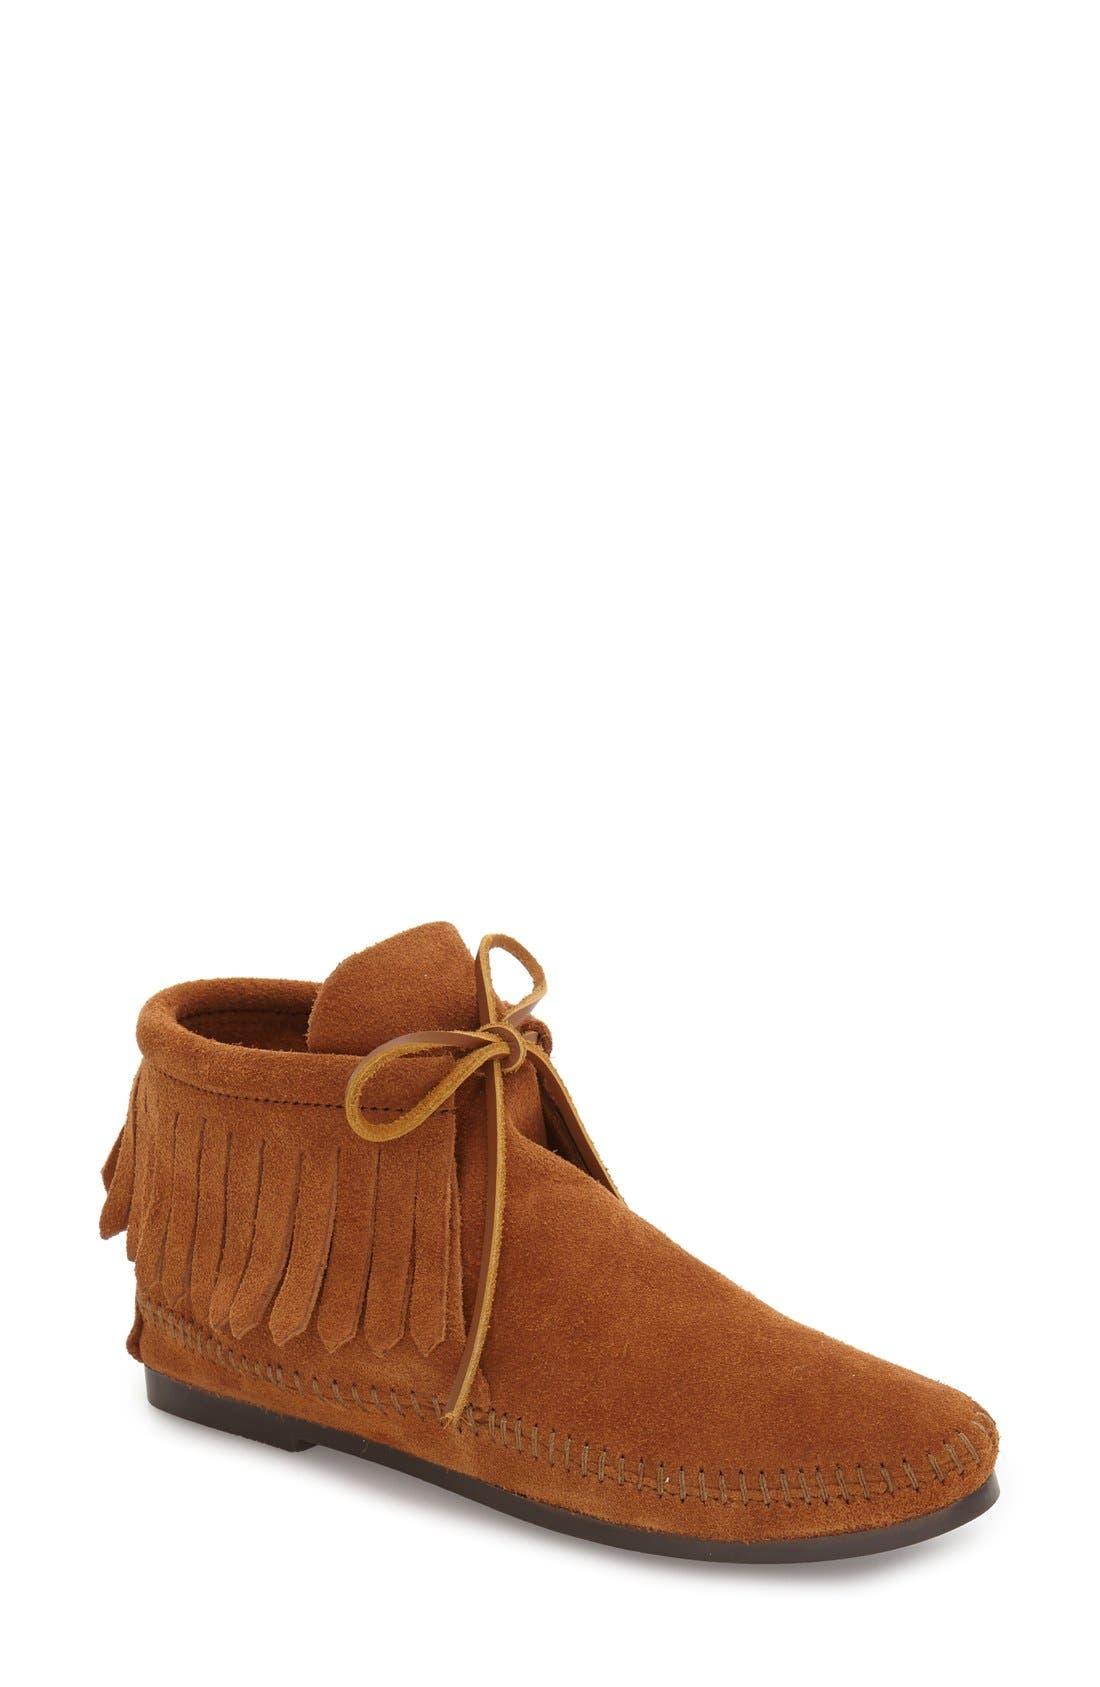 Alternate Image 1 Selected - Minnetonka Classic Fringed Chukka Style Boot (Women)